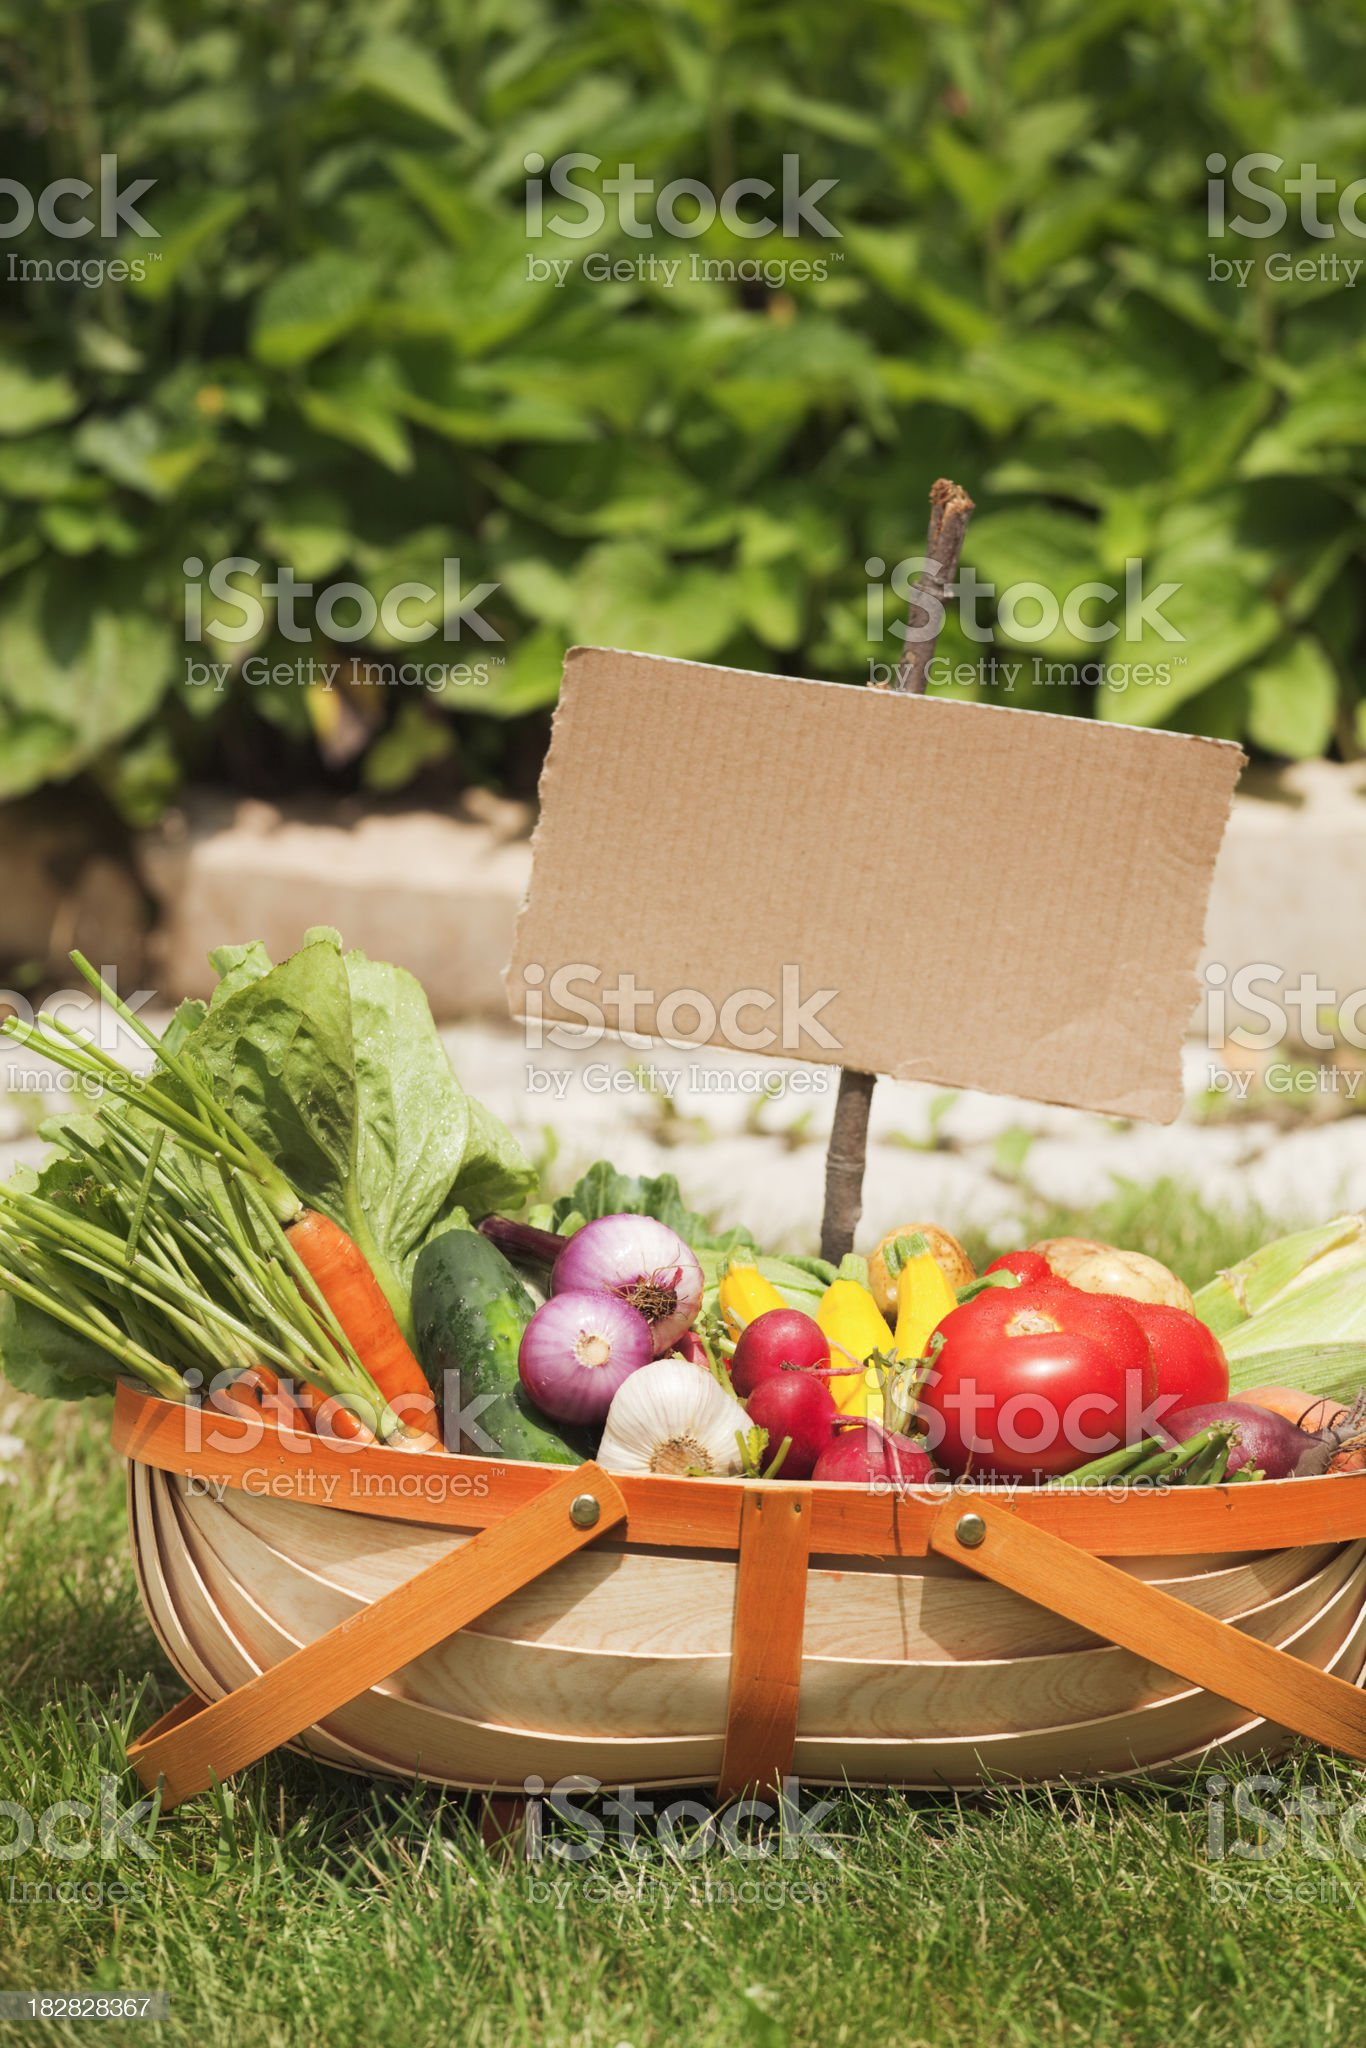 Summer Garden Vegetable Harvest in Basket with Cardboard Sign Vt royalty-free stock photo